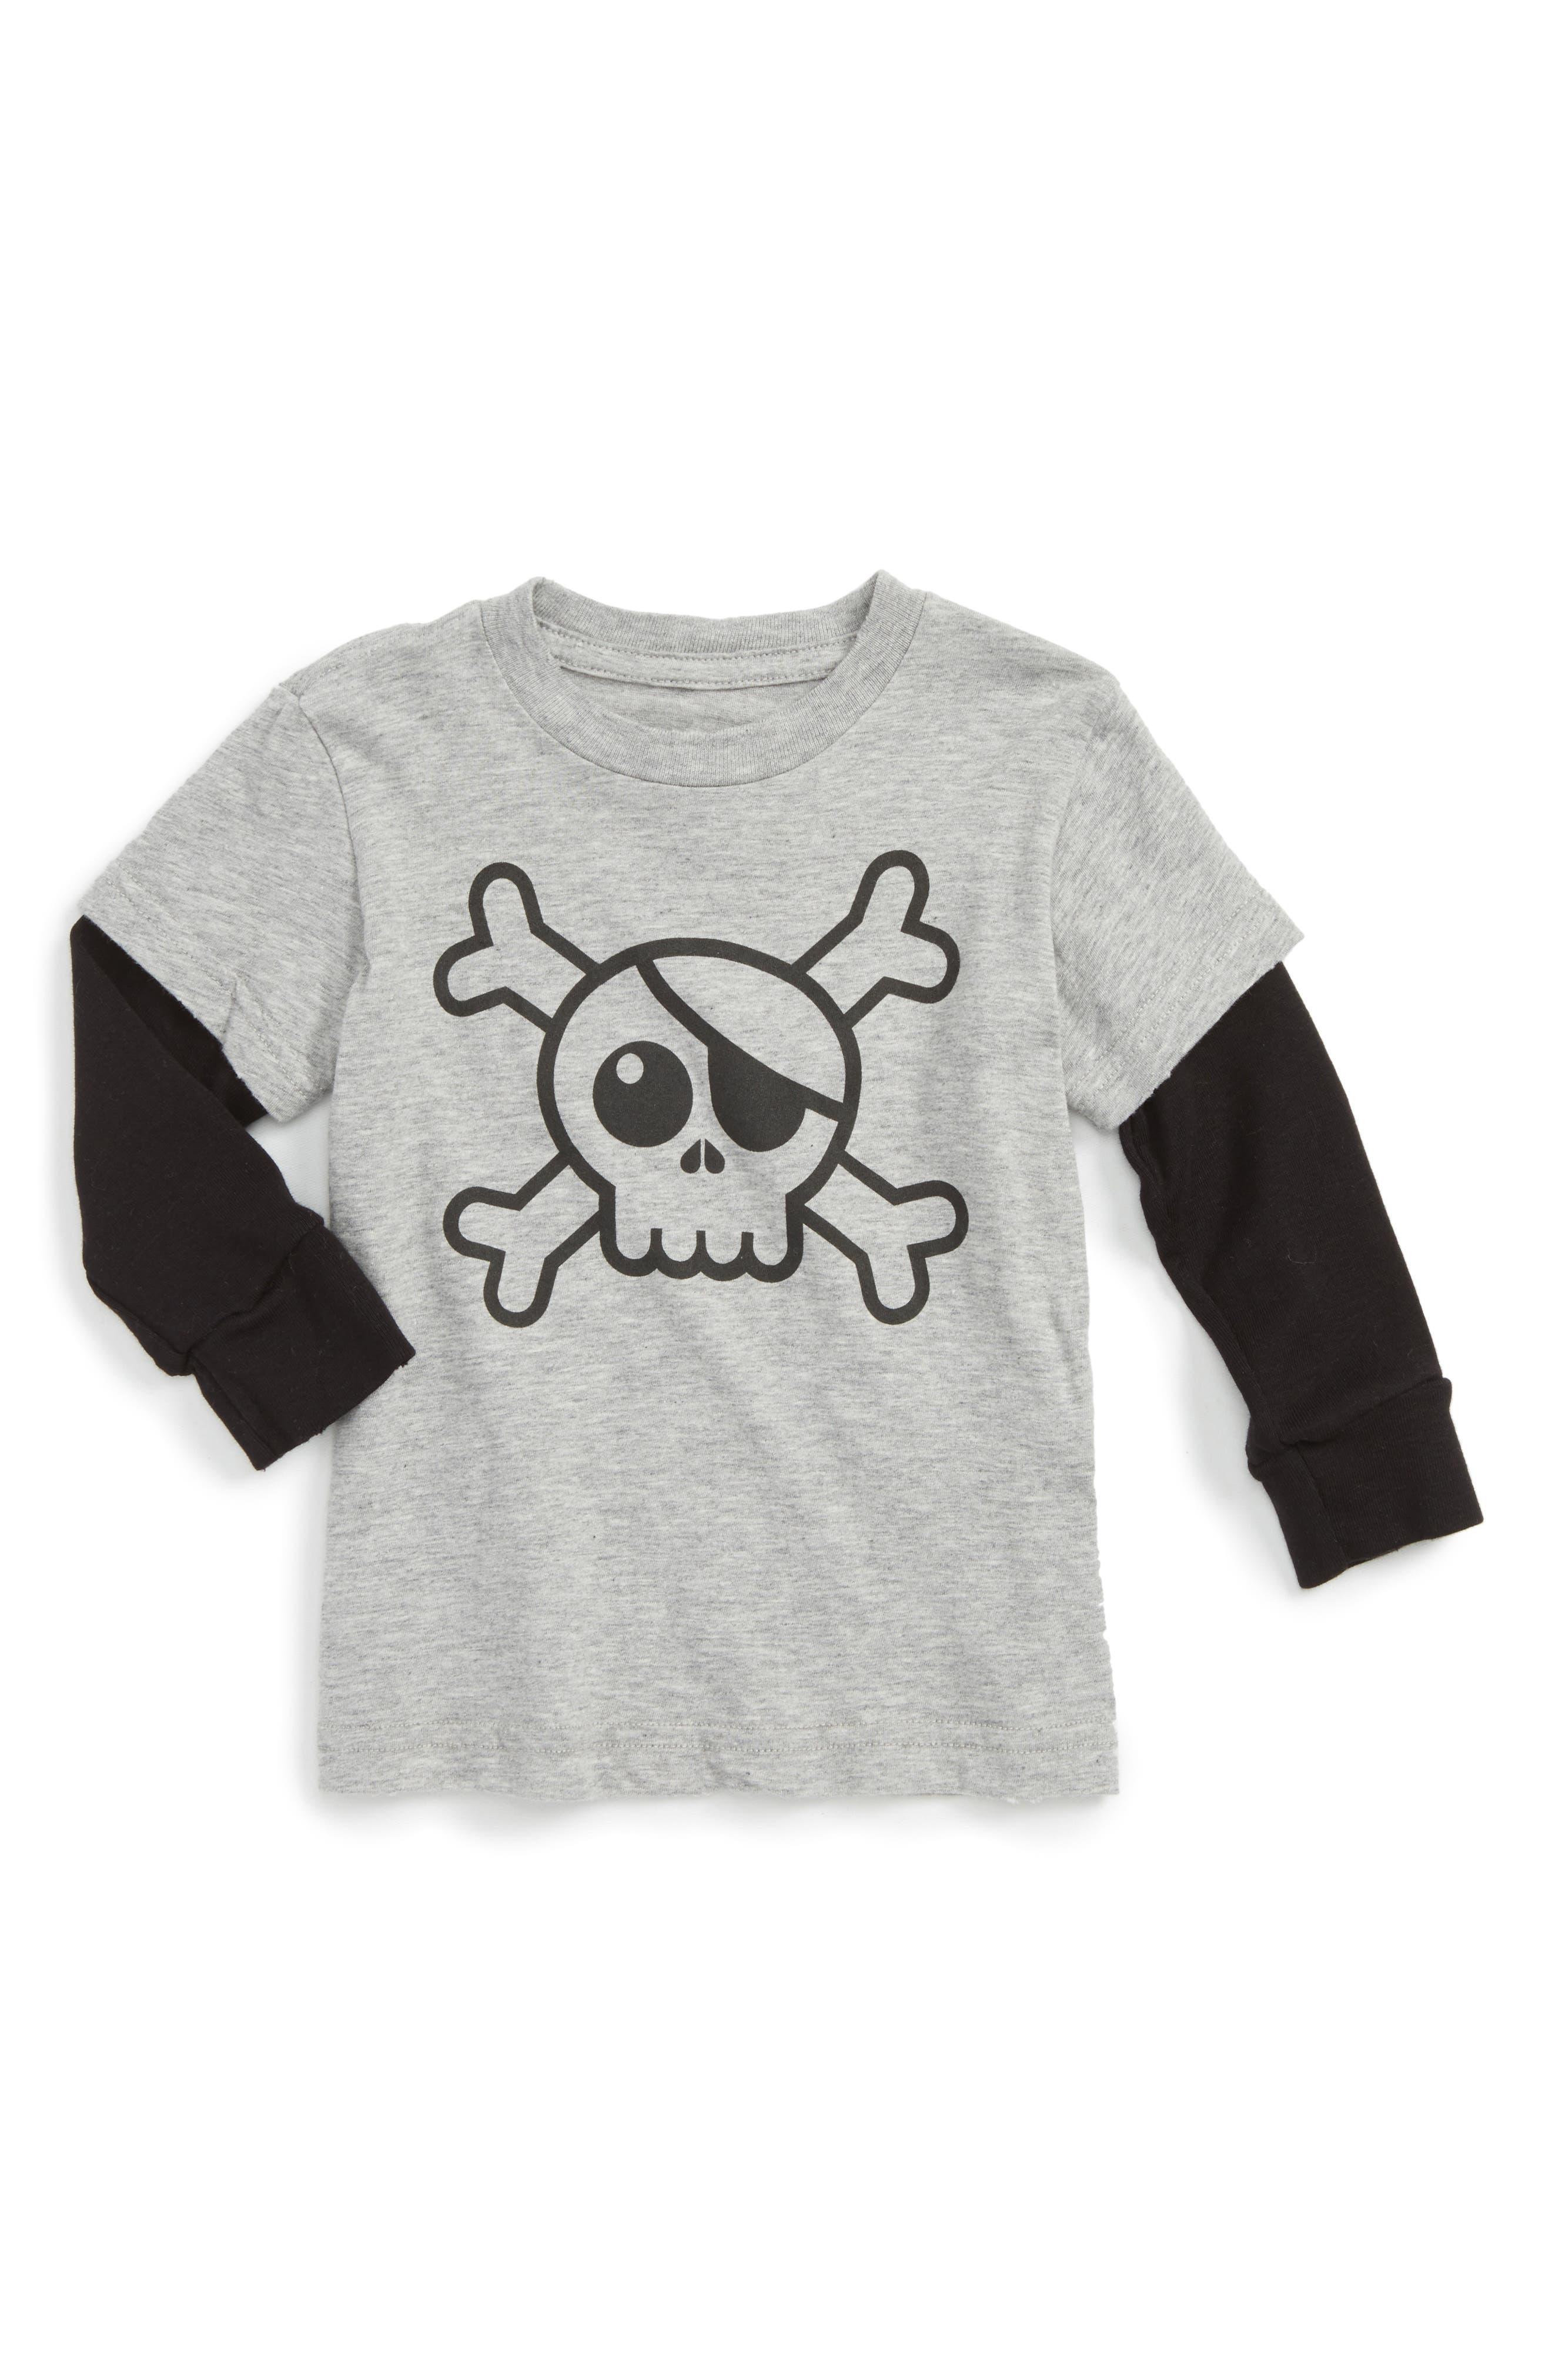 NUNUNU Skull Graphic T-Shirt (Baby)